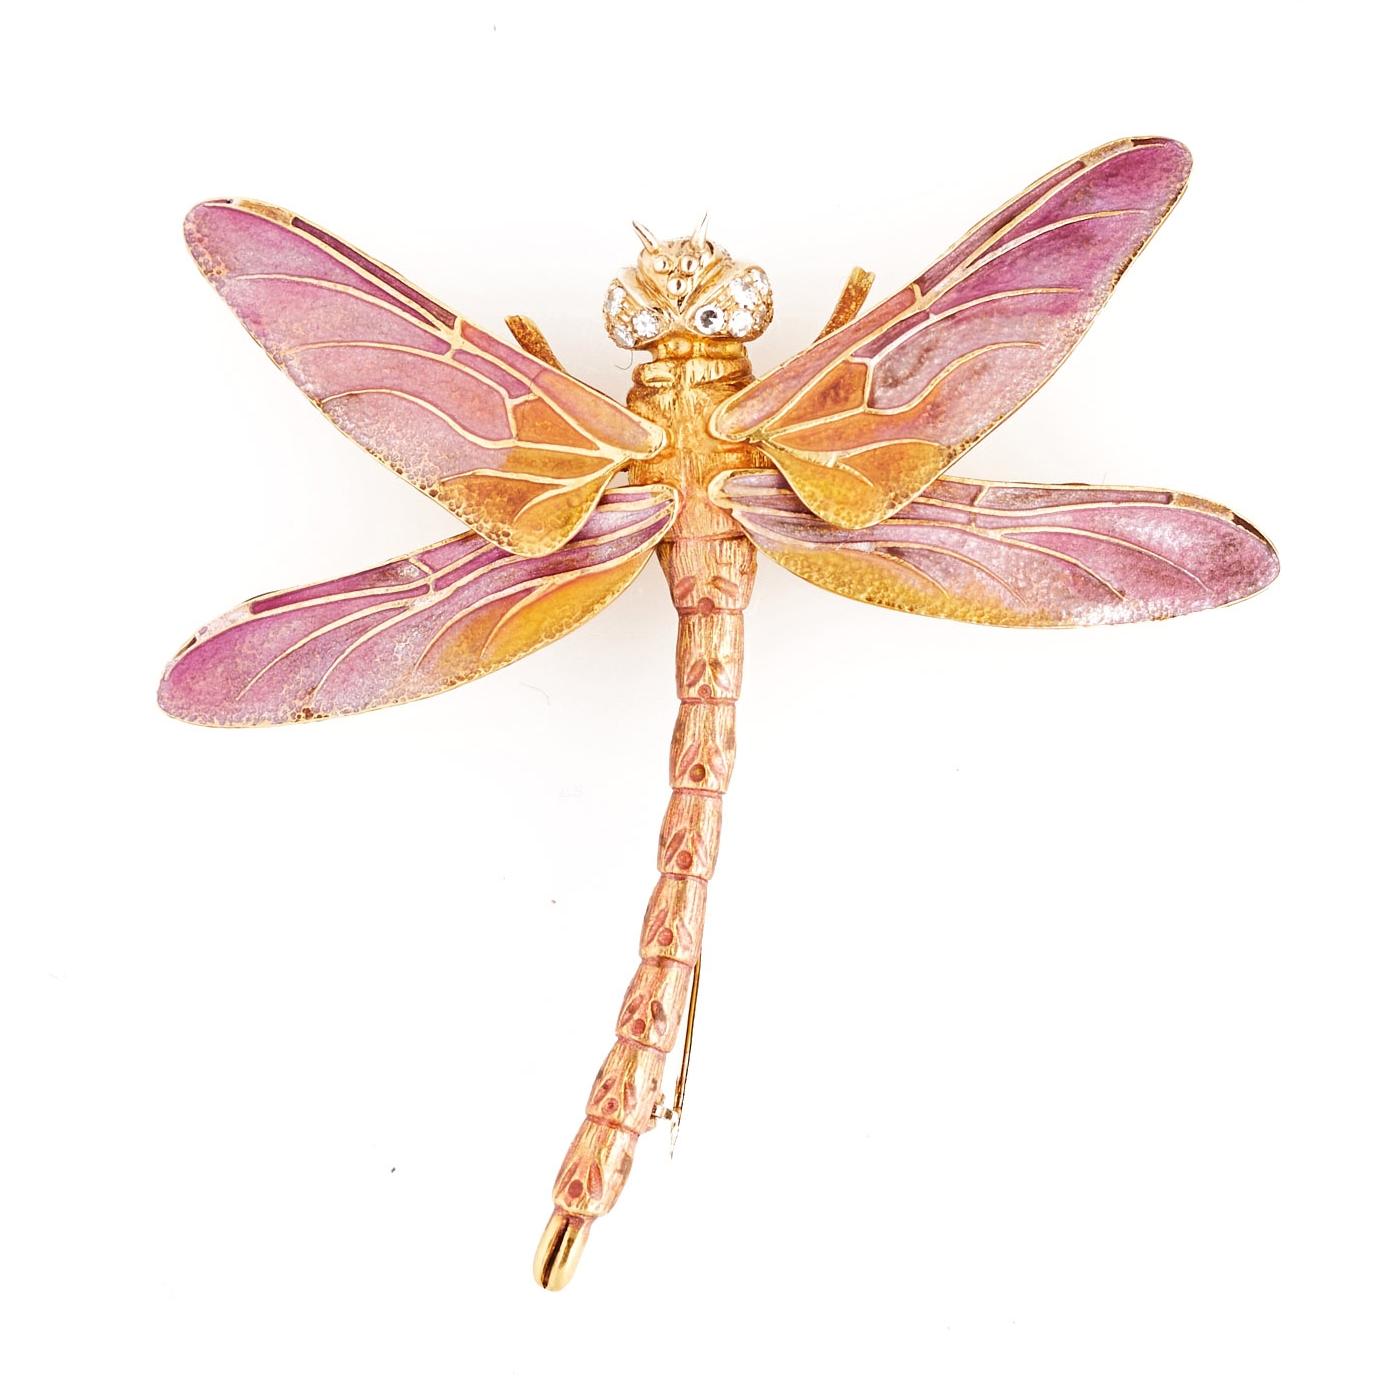 1960s Tiffany Enamel and Gem-Set Butterfly Brooch